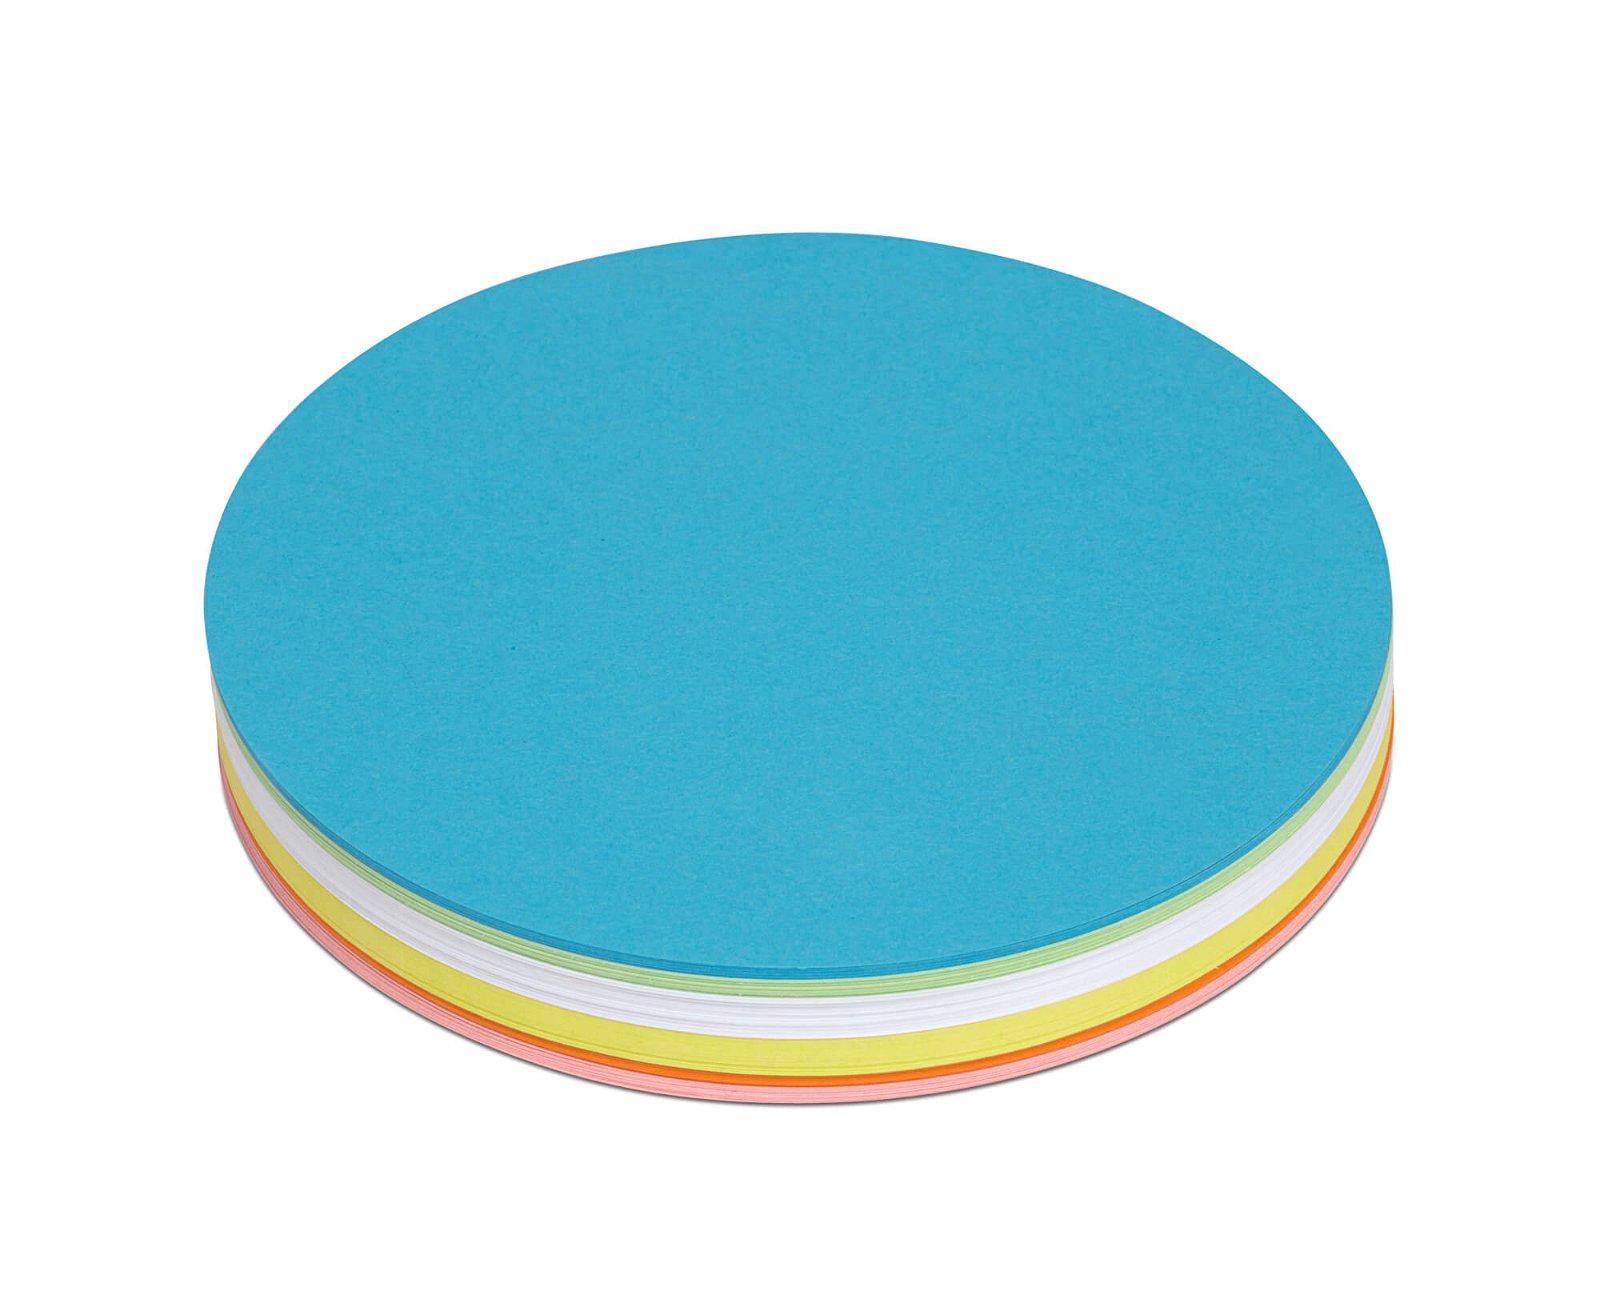 Moderationskarten rund, Ø 18,5 cm, 120 St./Pack, farbig sortiert